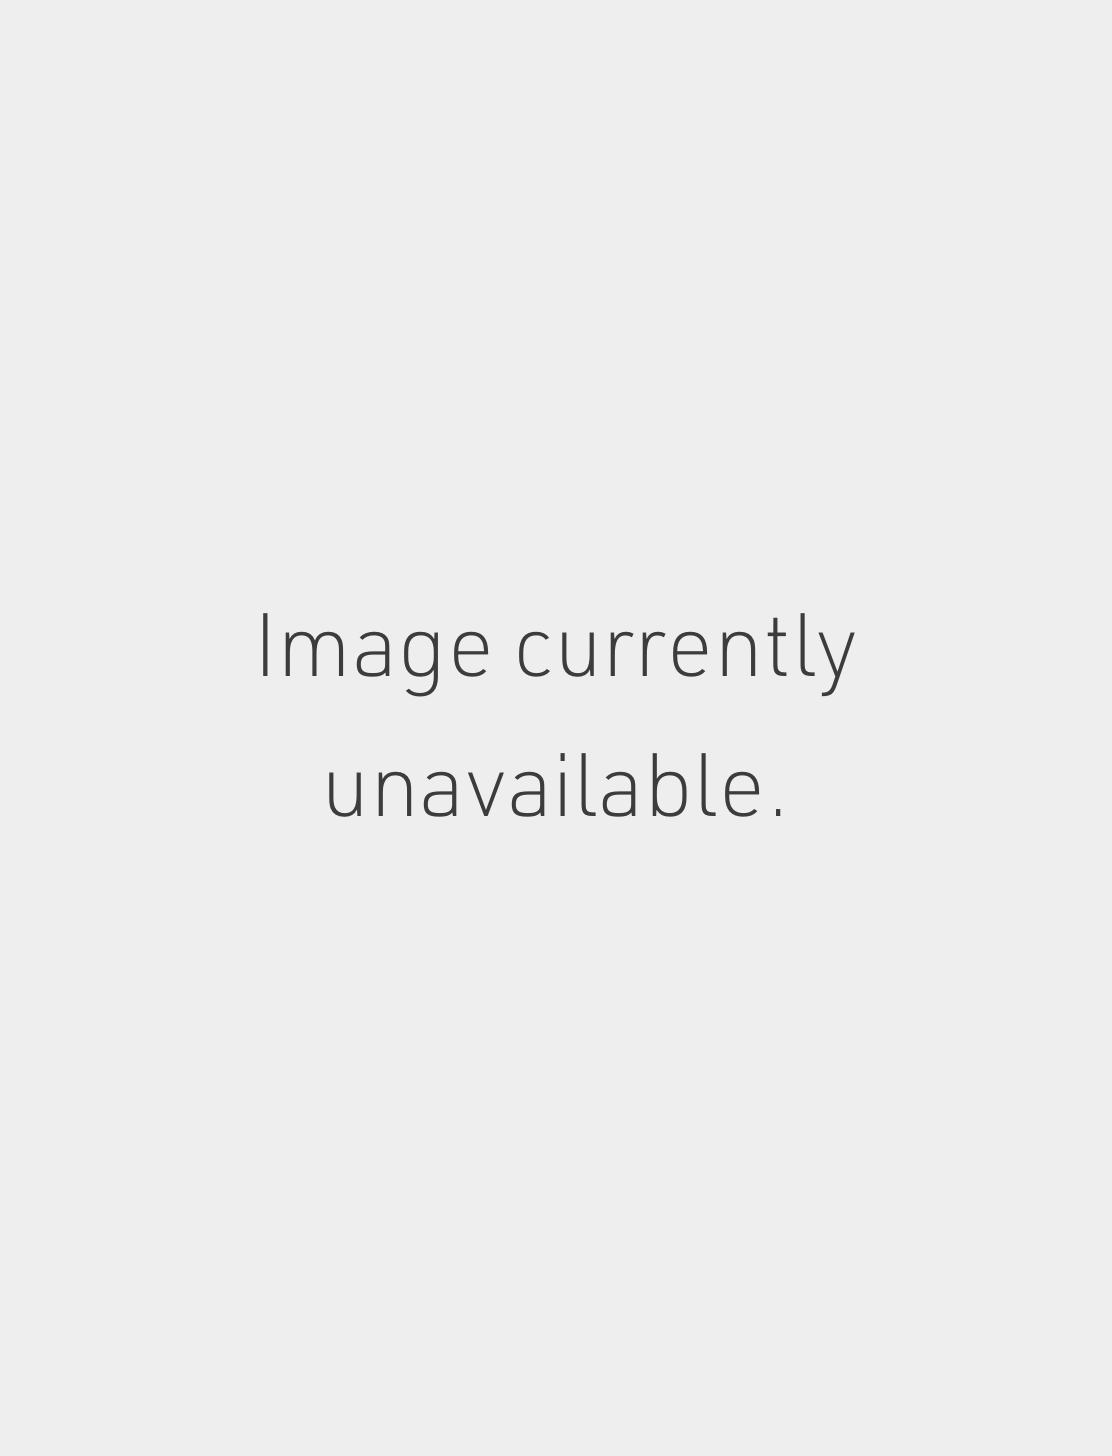 Opal 4 Ball Trinity Frontal - WHITE GOLD - 19 GA TASH - BACK Image #1